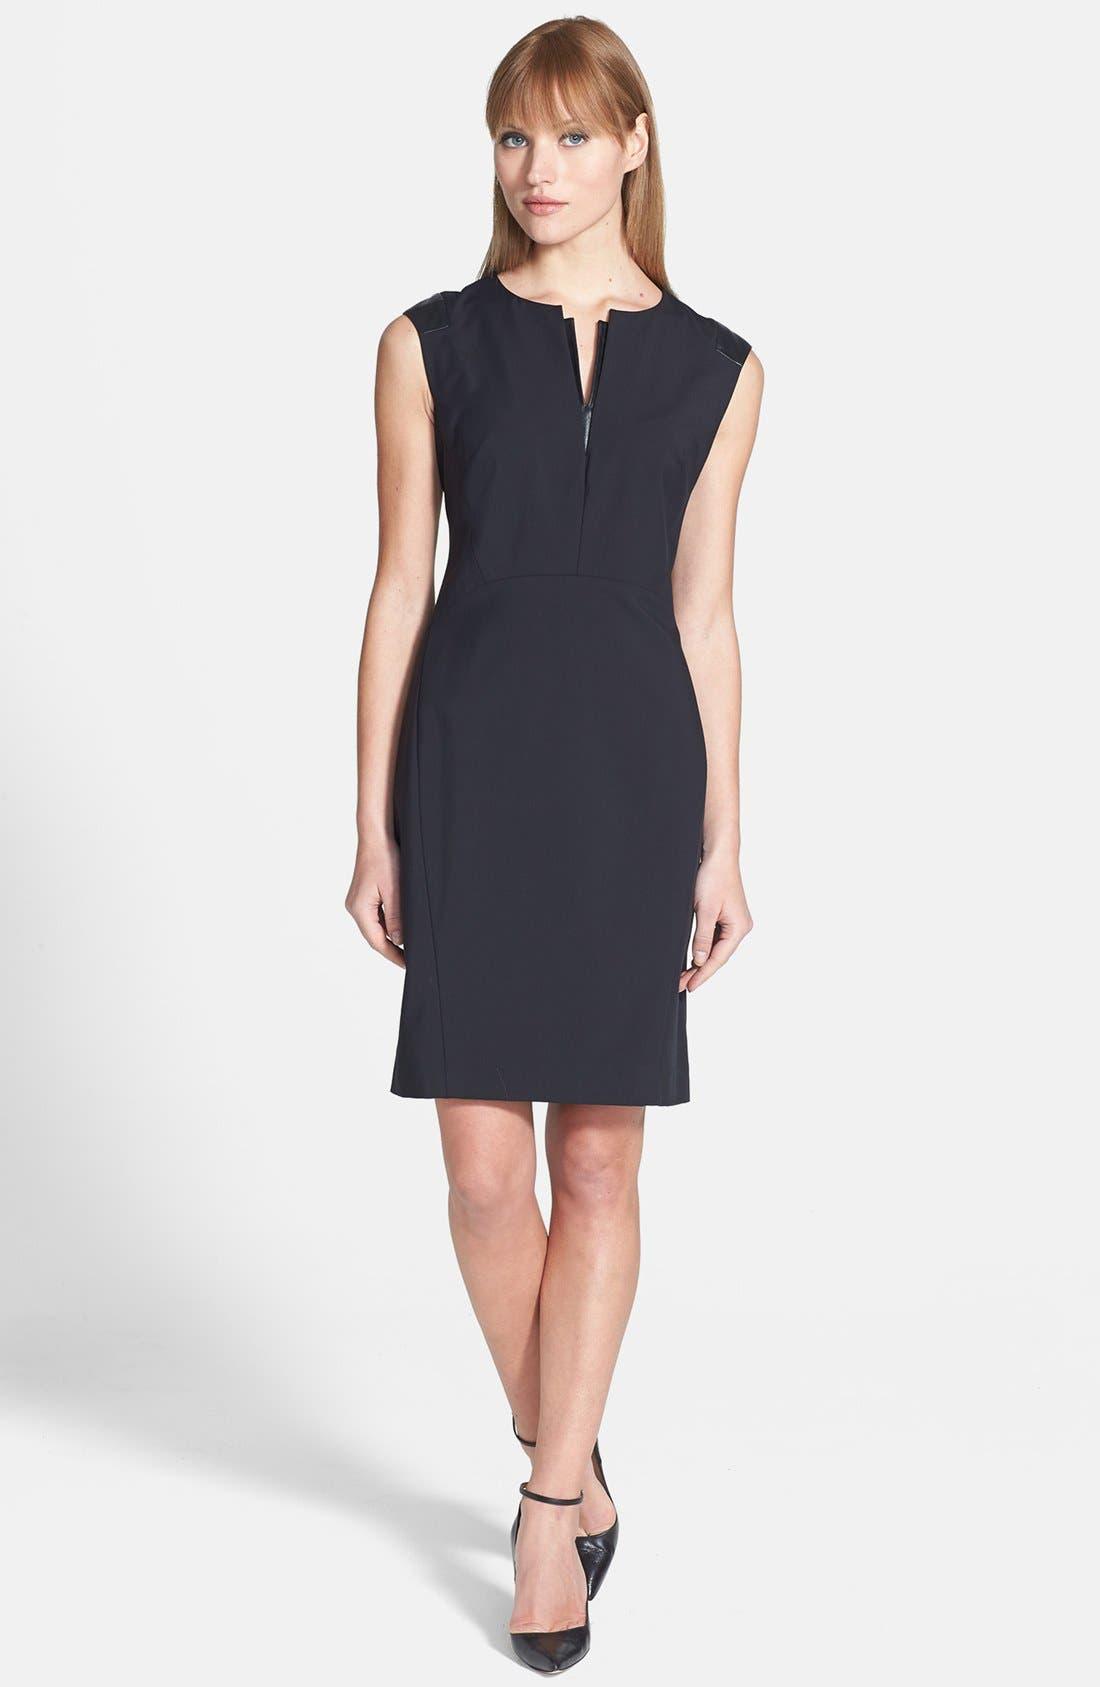 Alternate Image 1 Selected - Lafayette 148 New York 'Zelina' Stretch Dress with Leather Trim (Regular & Petite)